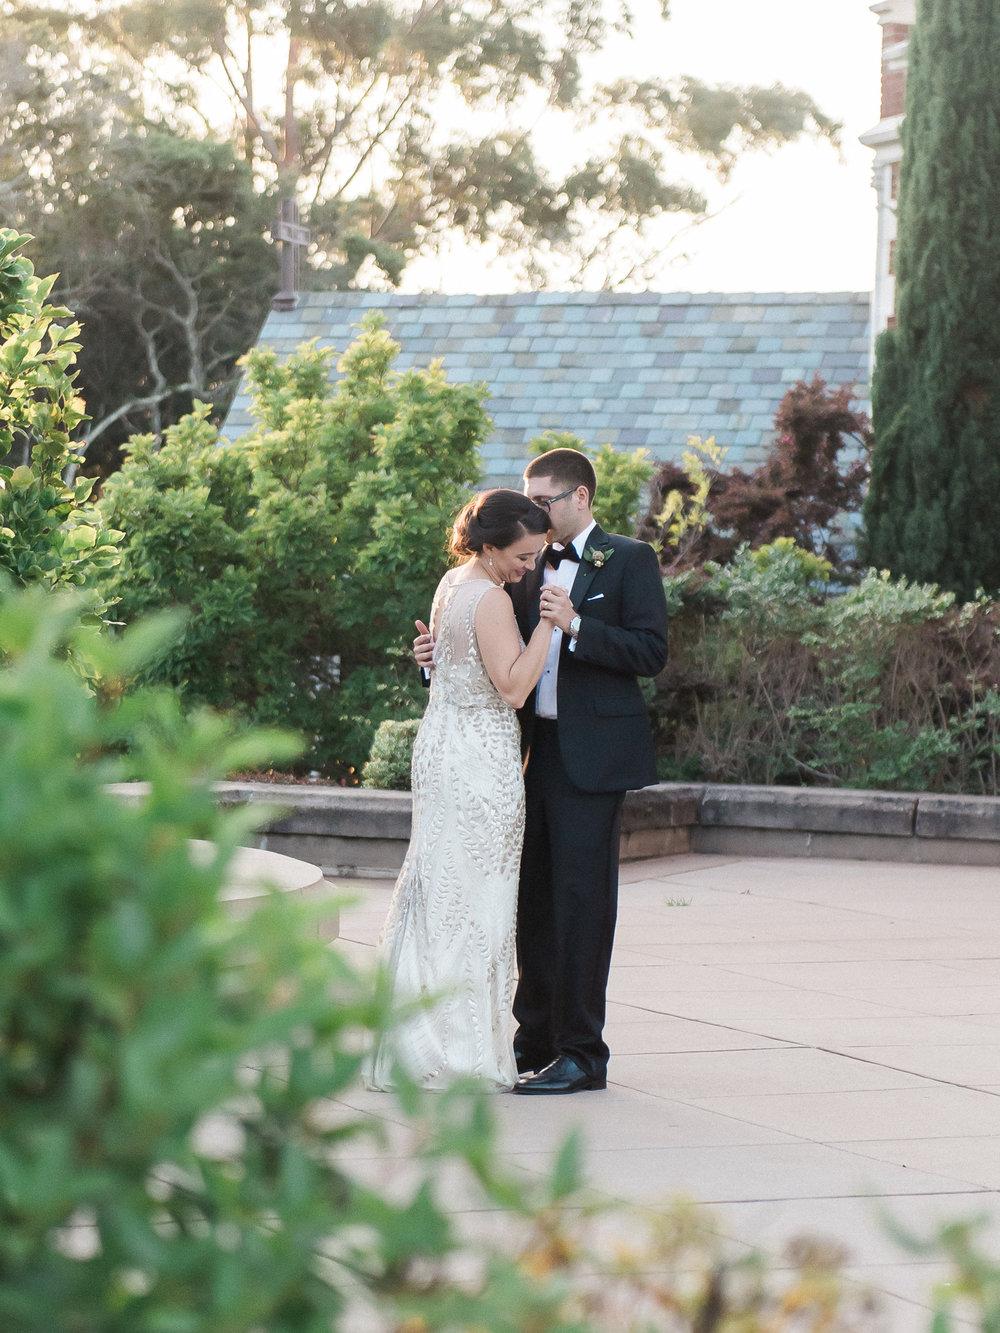 Sarah+Warren_wedding_spp-119.jpg